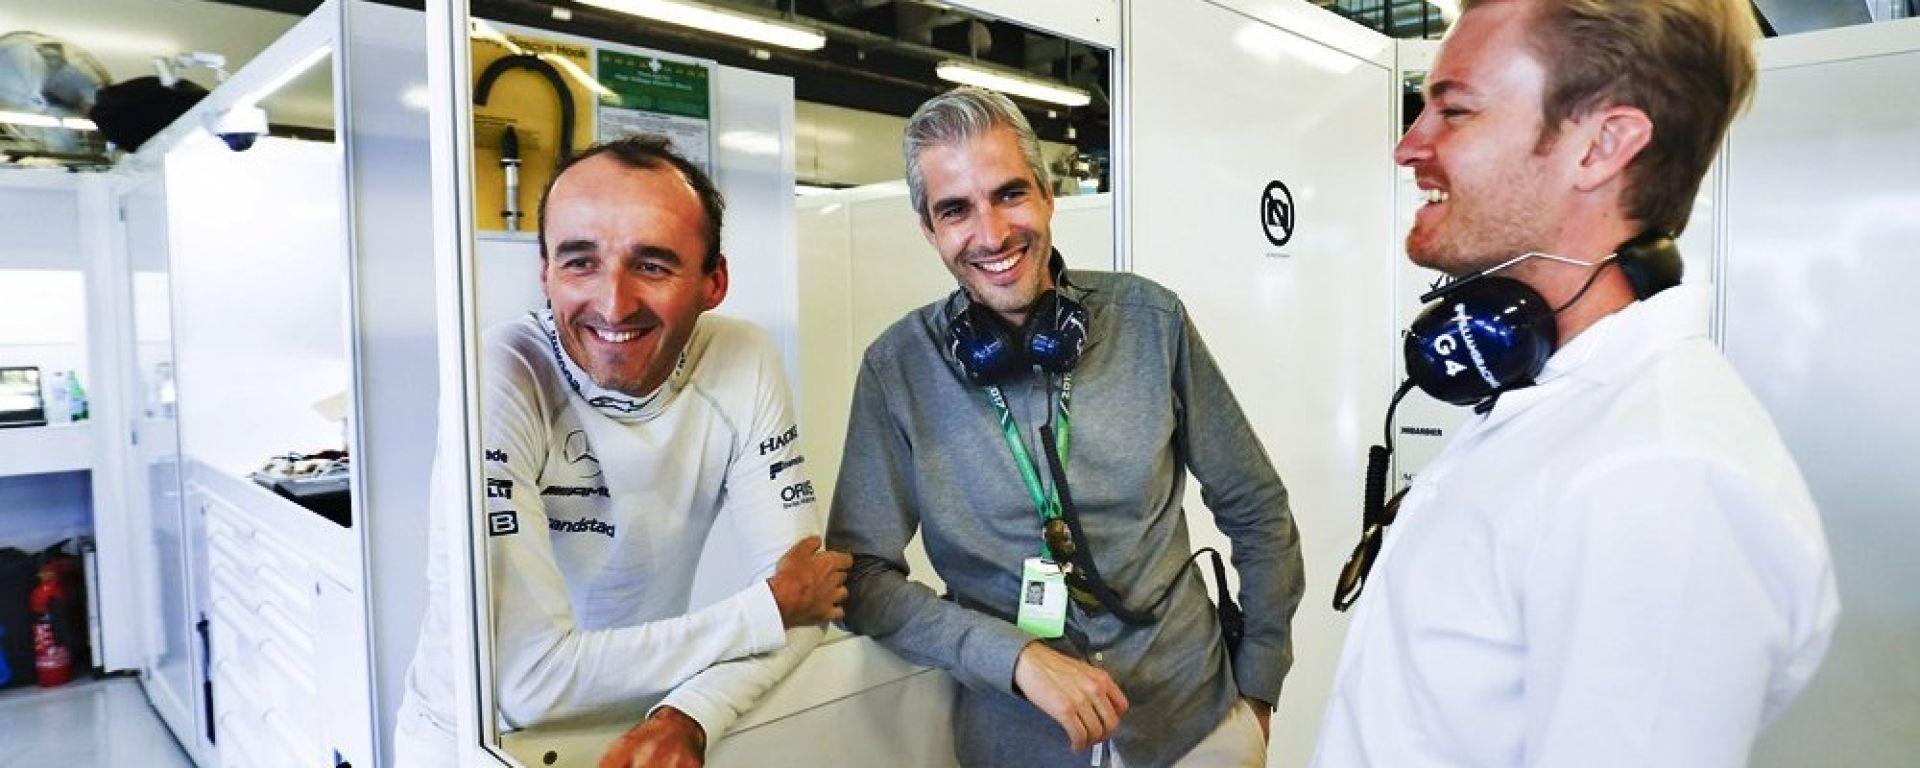 Nico Rosberg e Robert Kubica